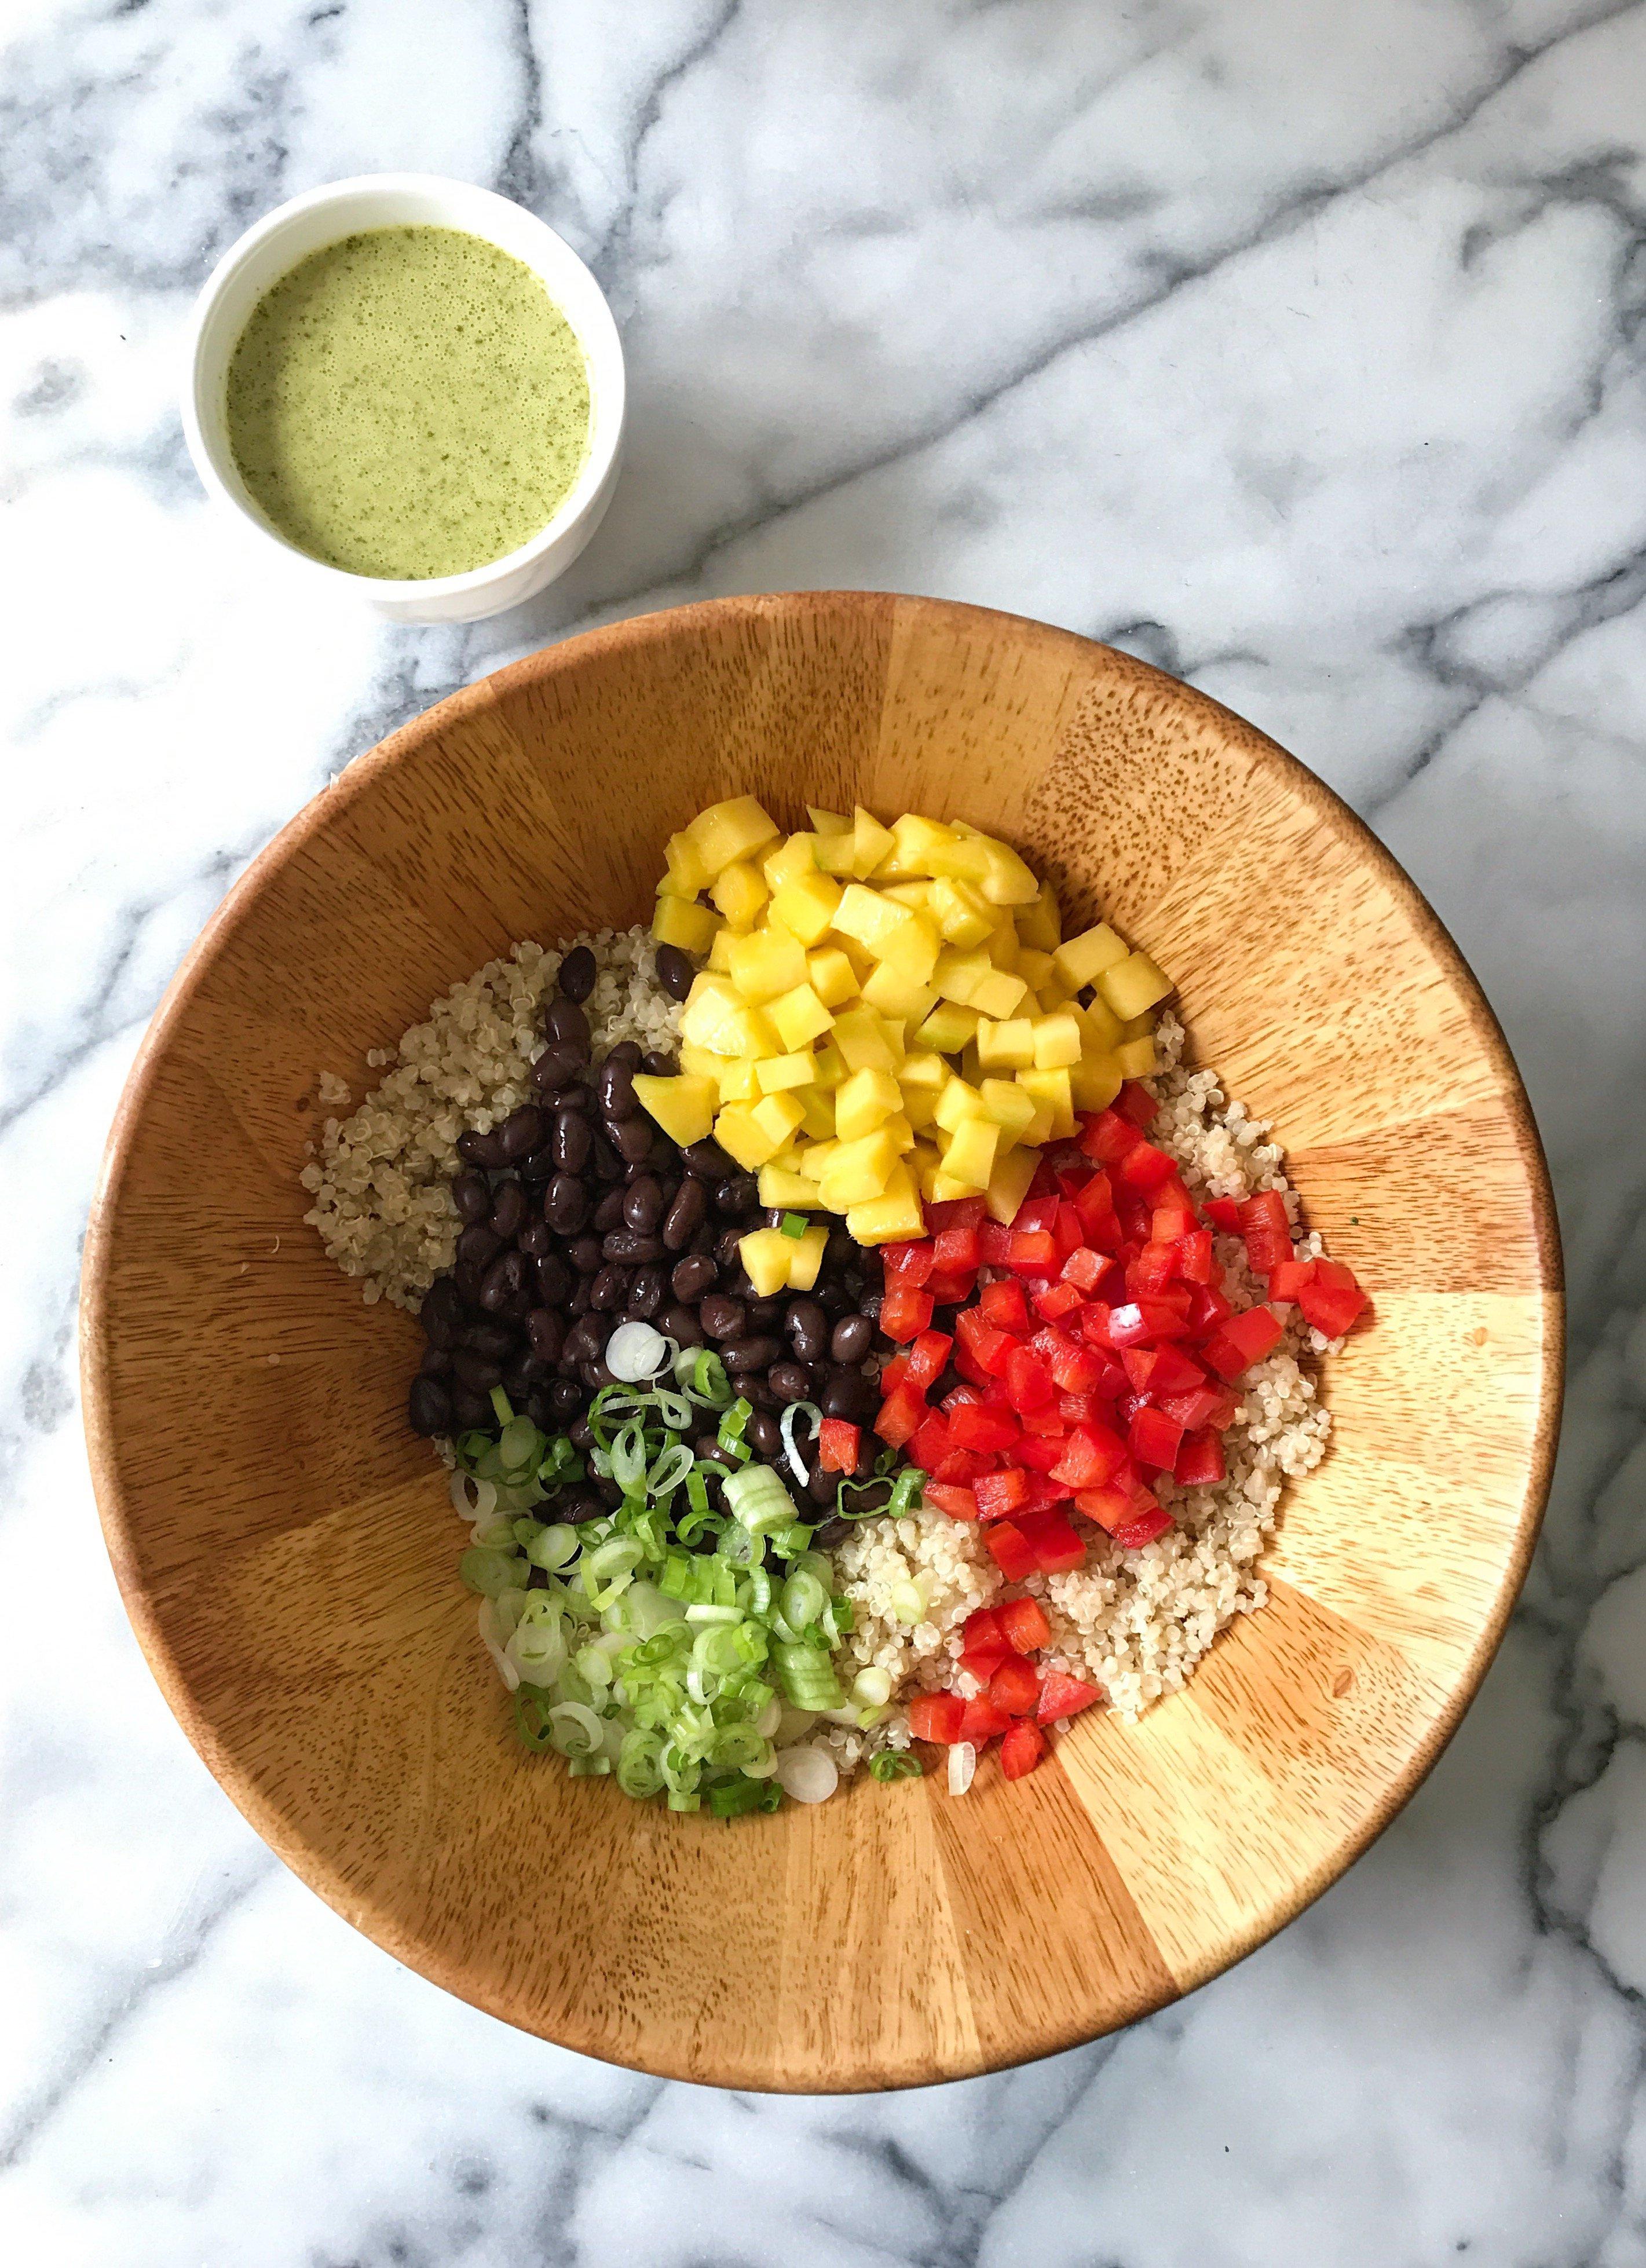 Mango Black Bean Quinoa Salad Lime dressing gluten free #glutenfreerecipes www.healthygffamily.com